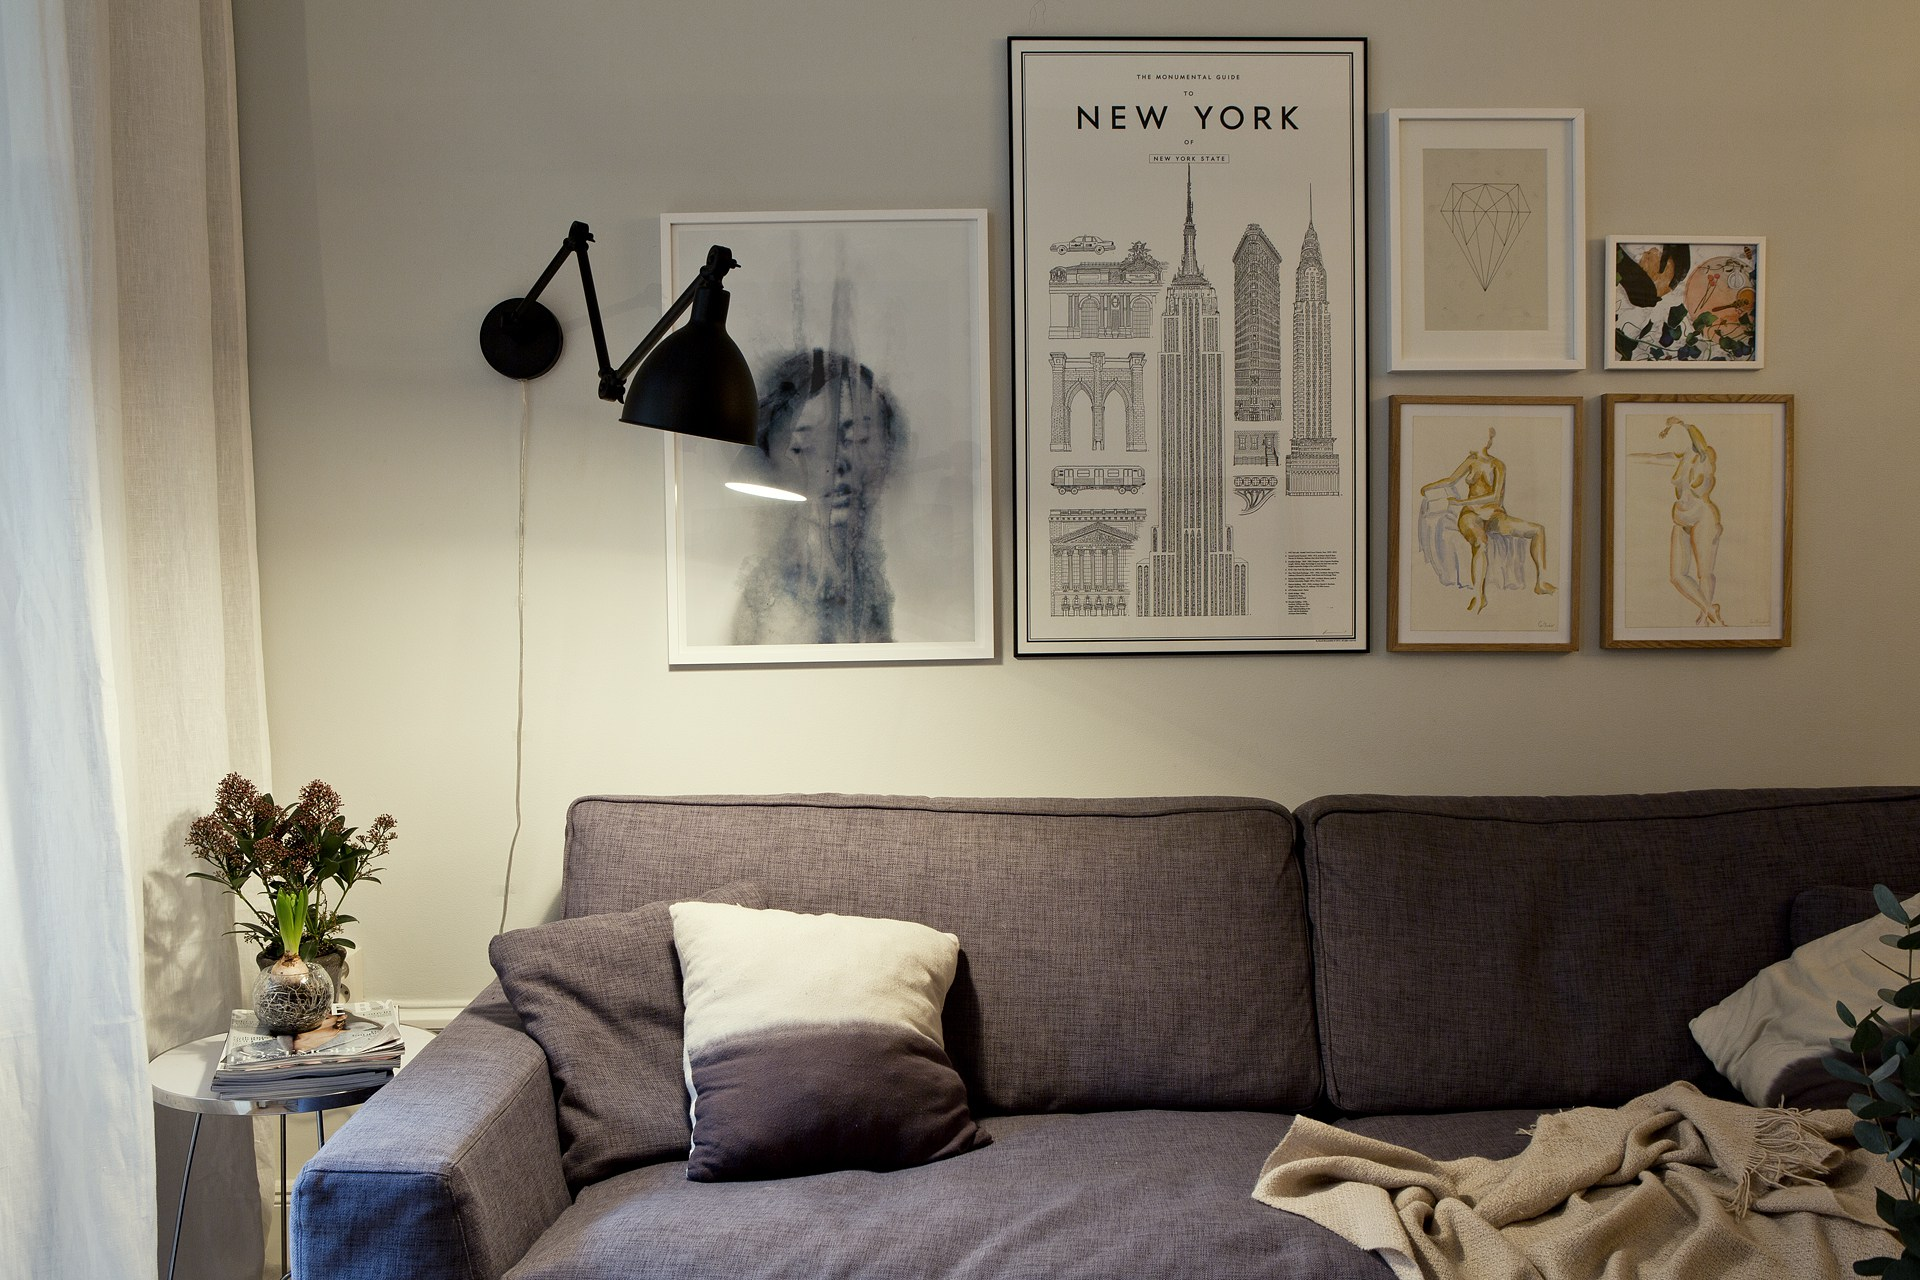 iluminación nórdica - lamparas de diseño escandinavo ilu puntual